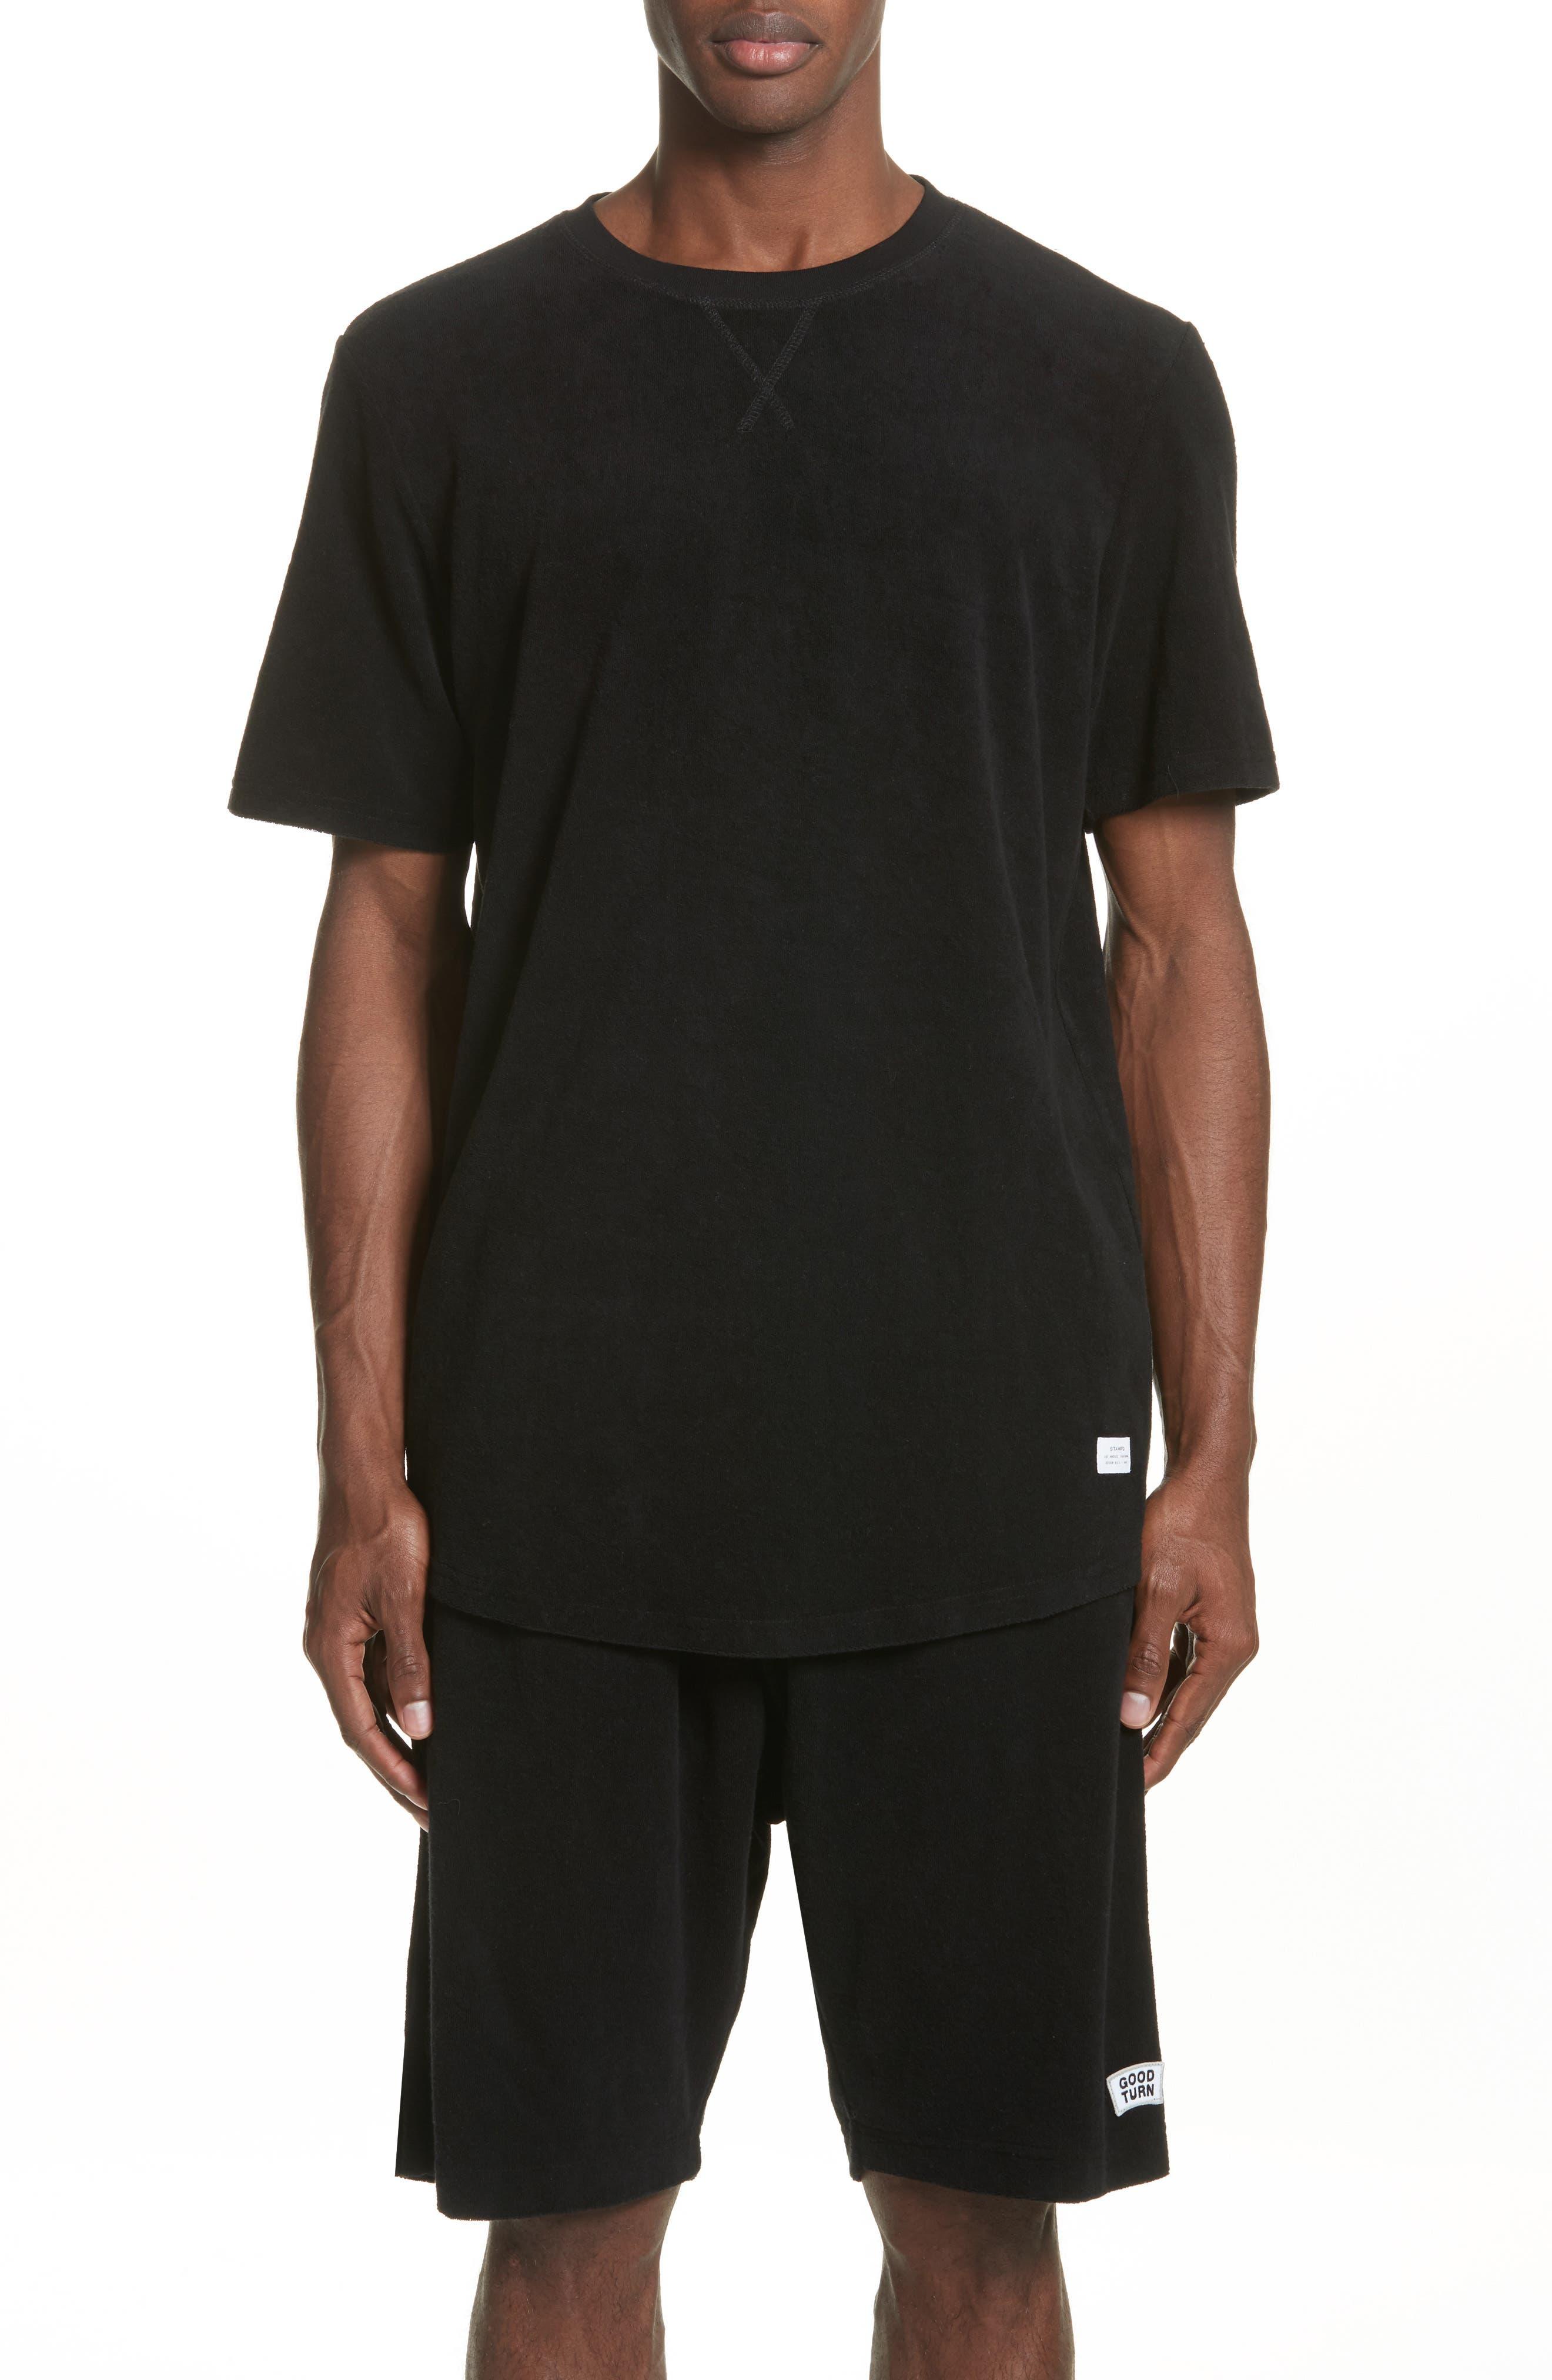 STAMPD Good Turn Towel T-Shirt